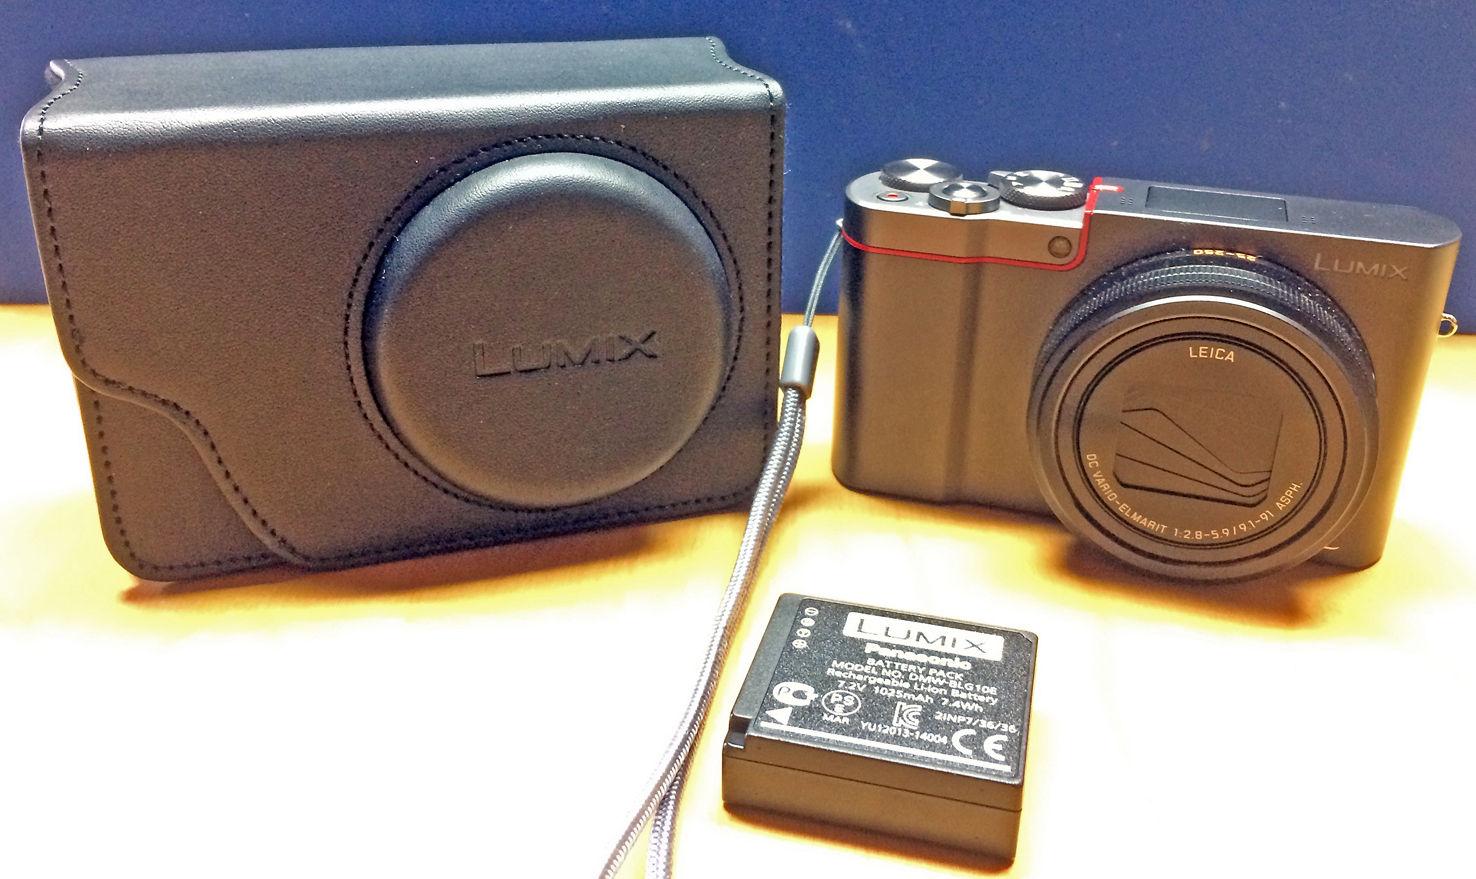 Panasonic Lumix DMC-TZ101 silber B-Ware vom Fachhändler TZ 101 neuwertig